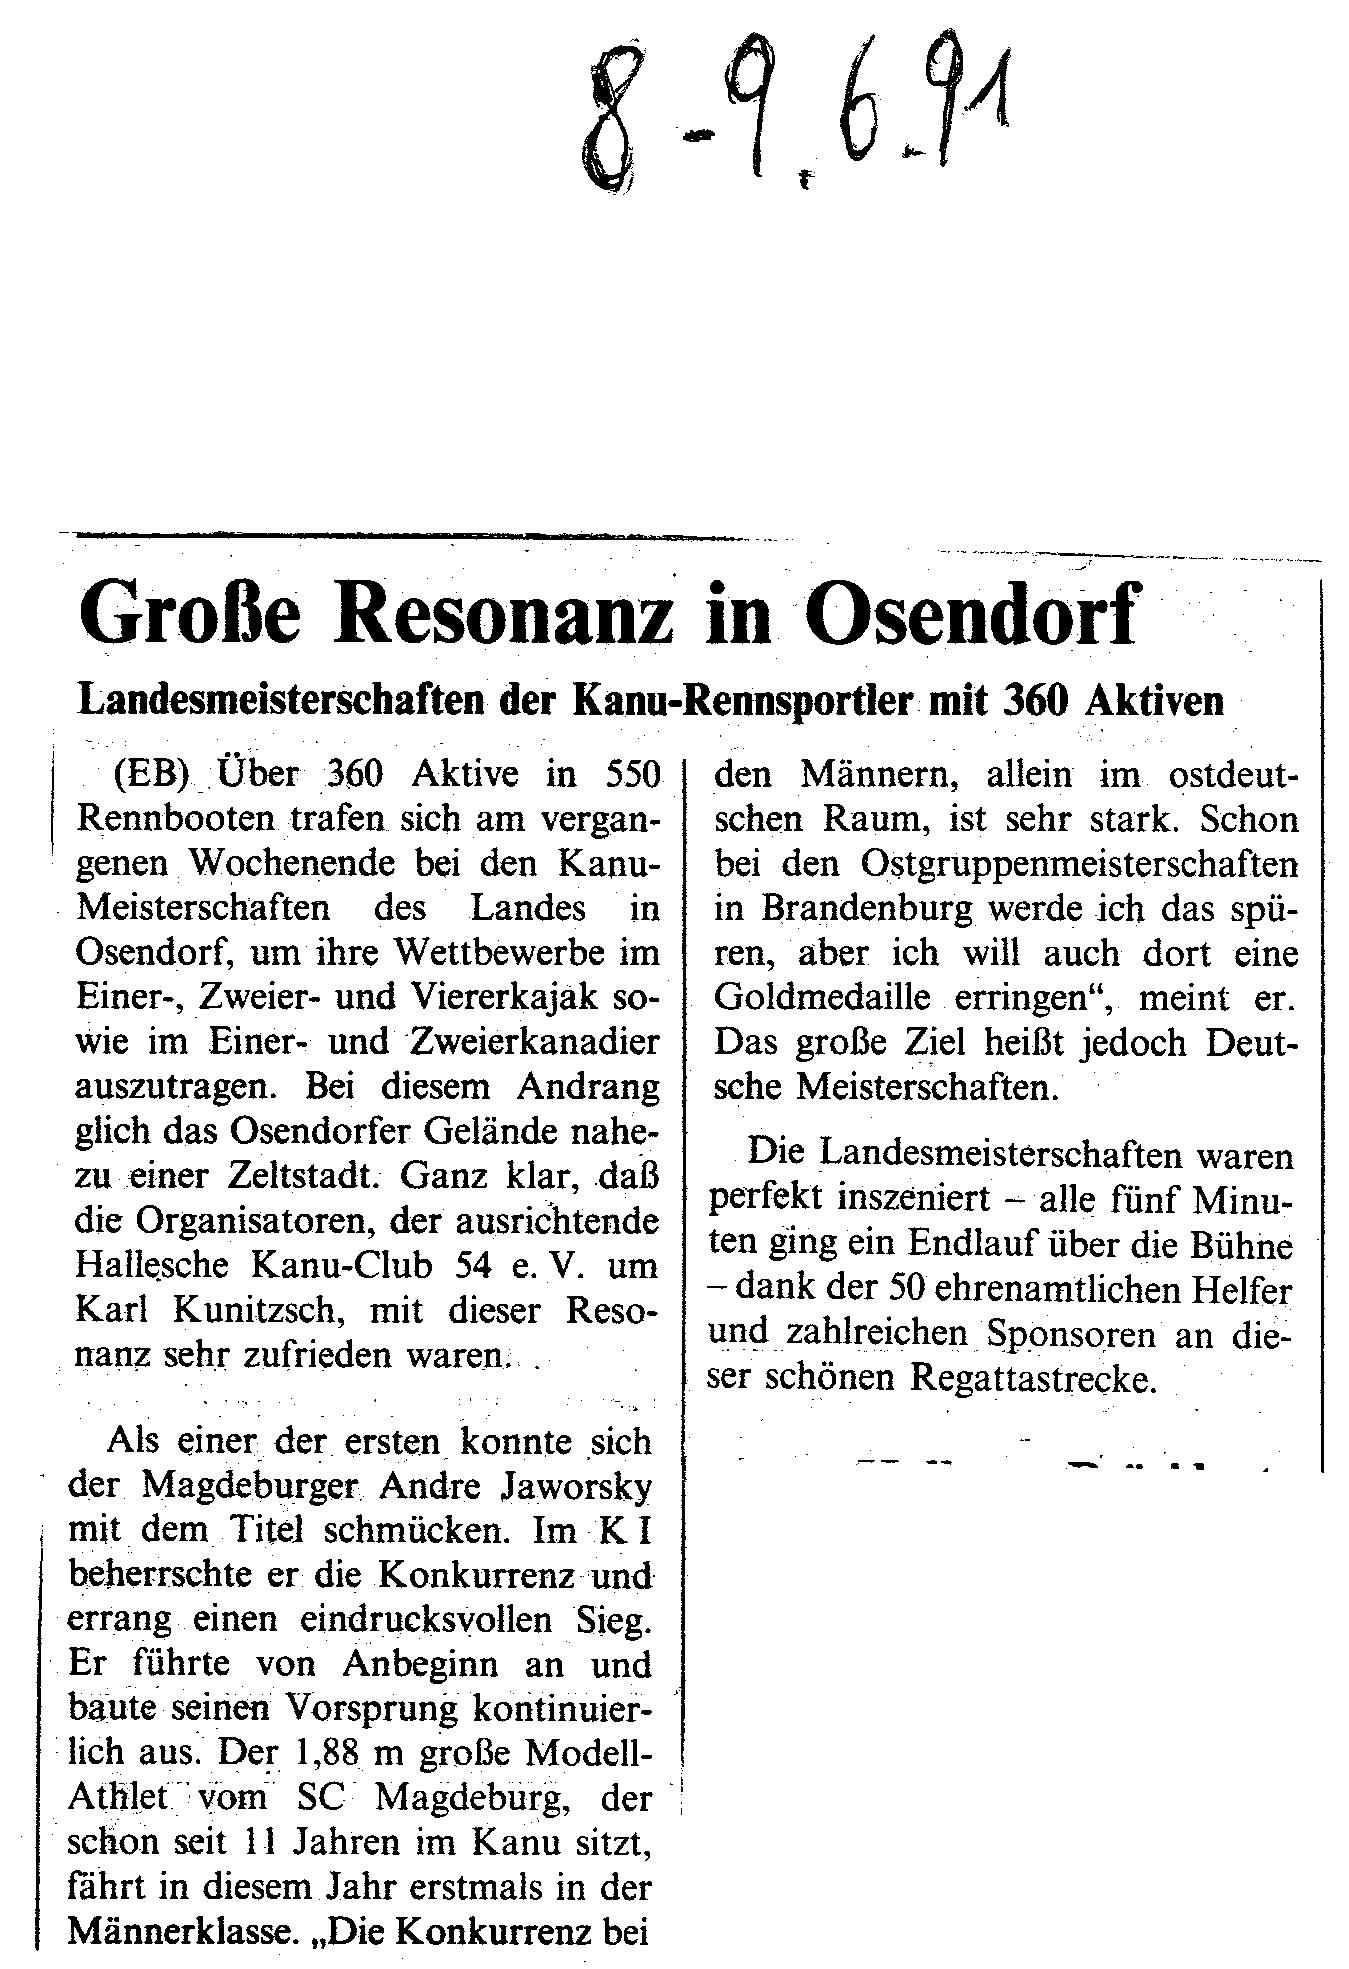 1991-06-09 Große Resonanz in Osendorf